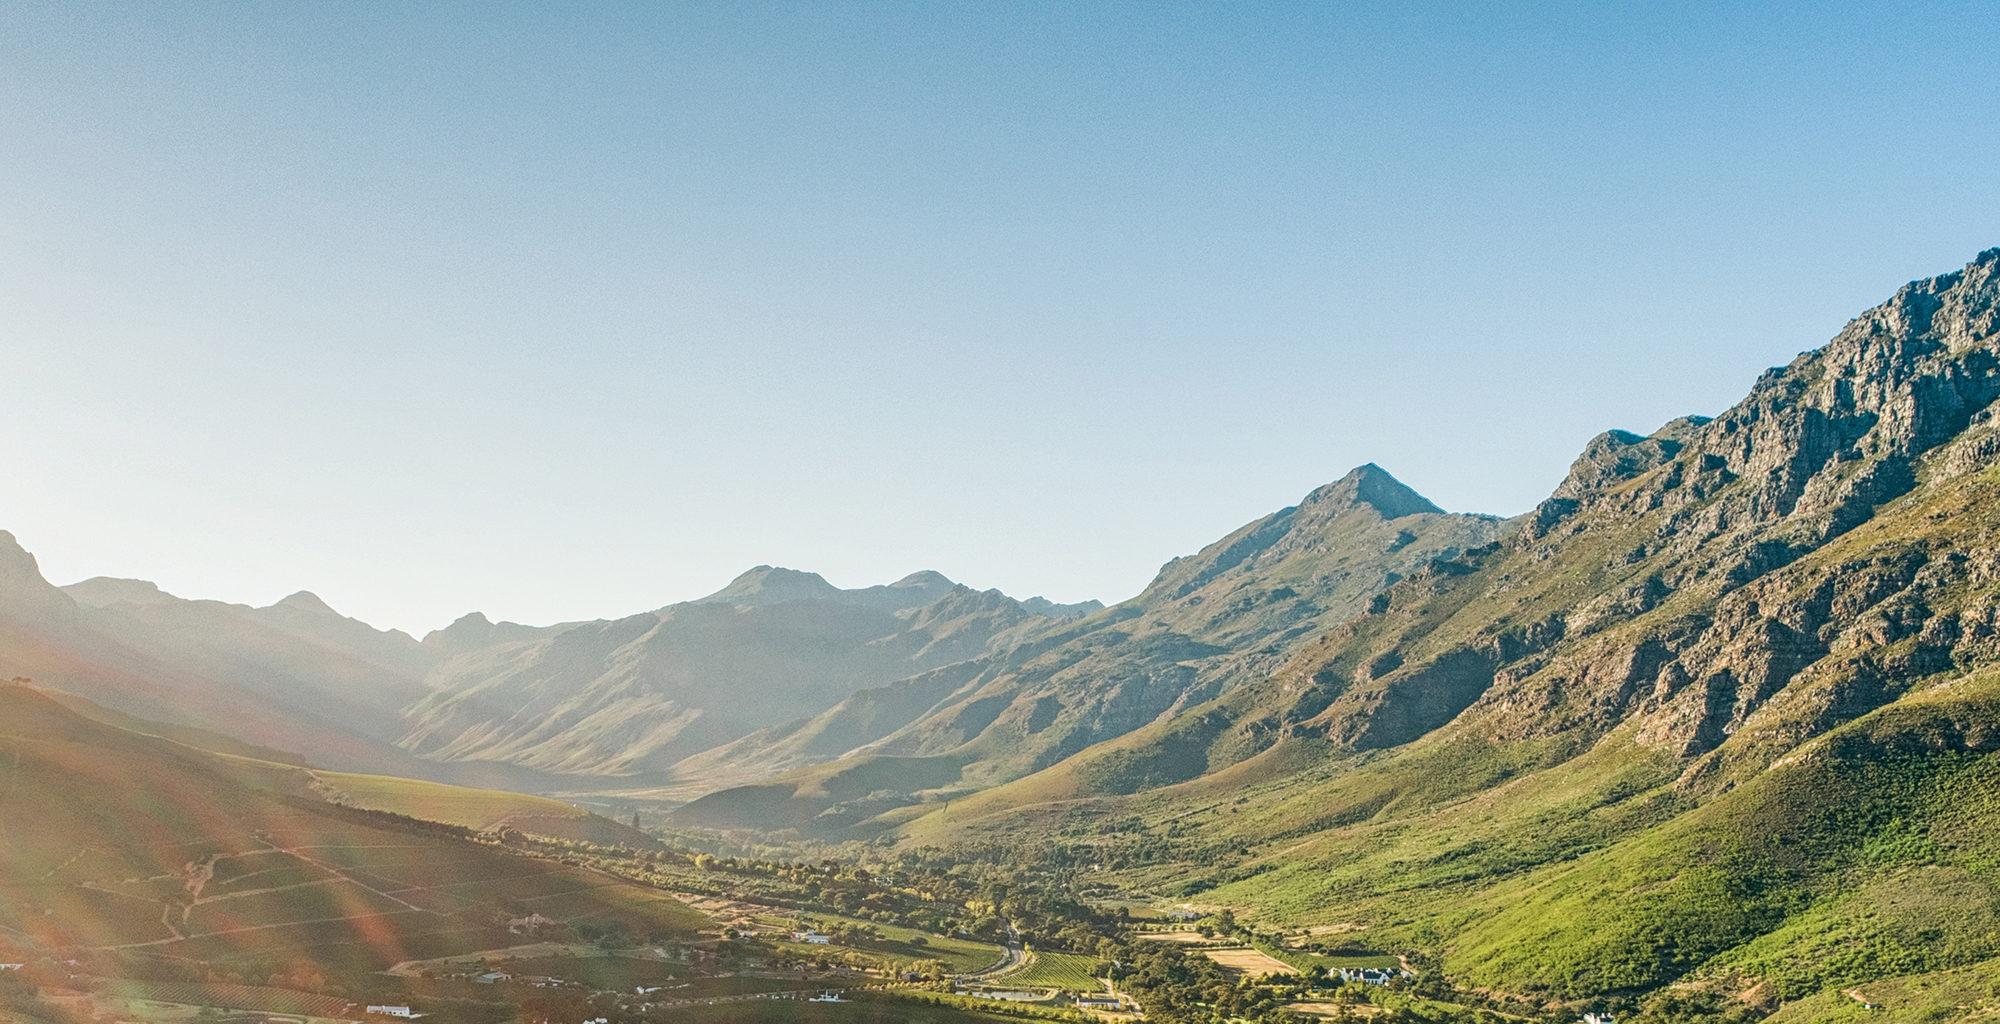 South-Africa-Cape-Town-Province-Landscape